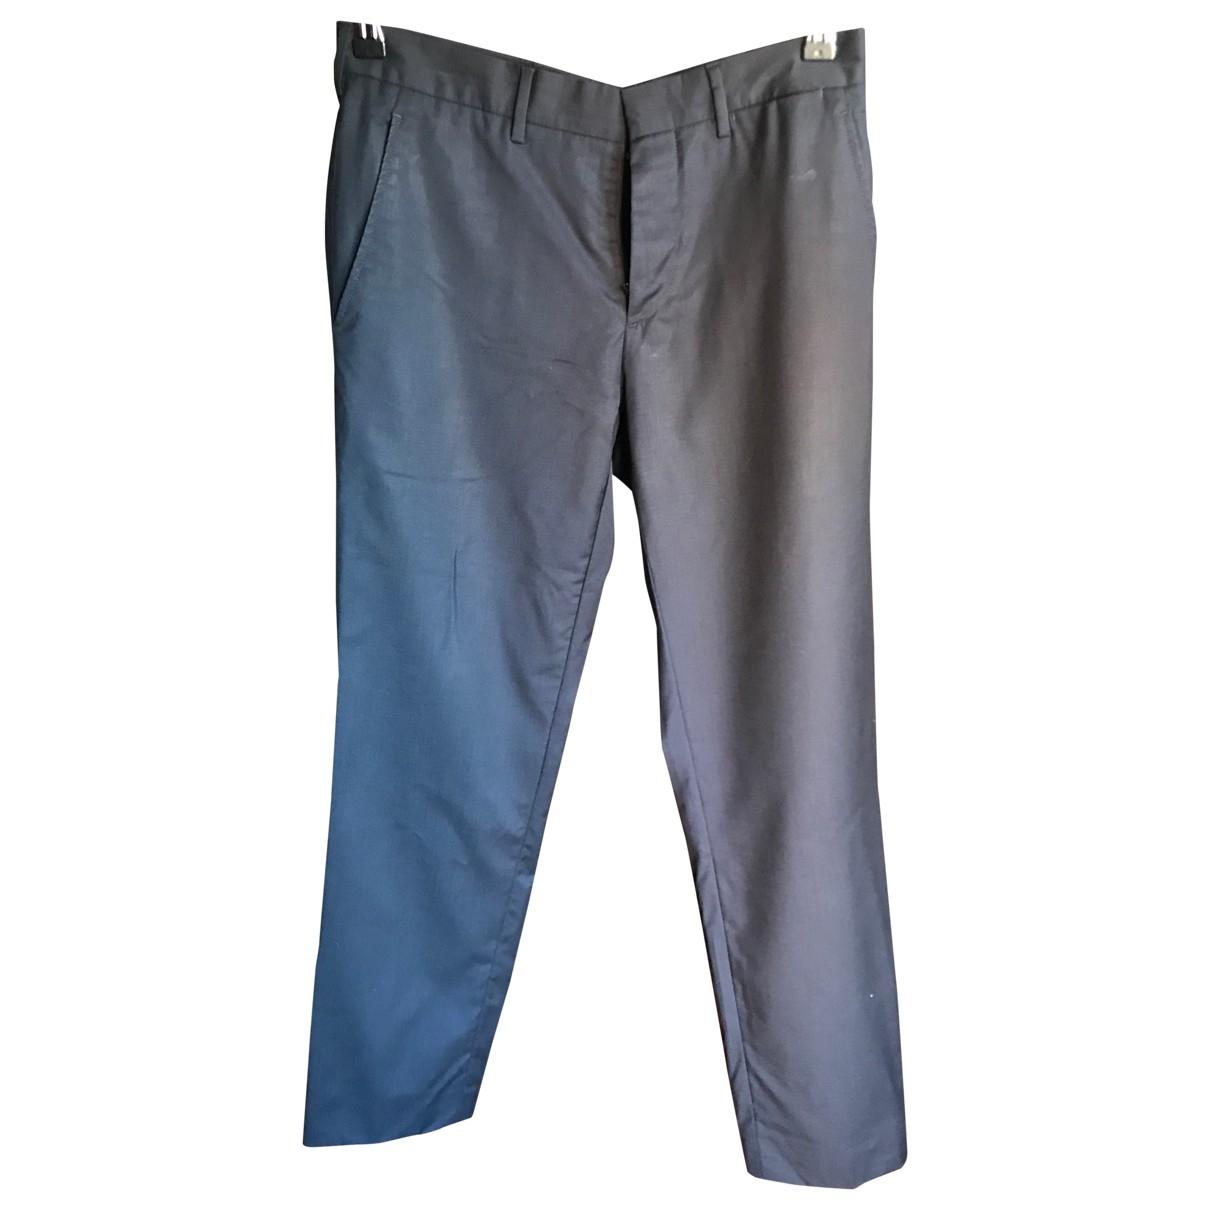 Prada - Pantalon   pour homme en laine - bleu